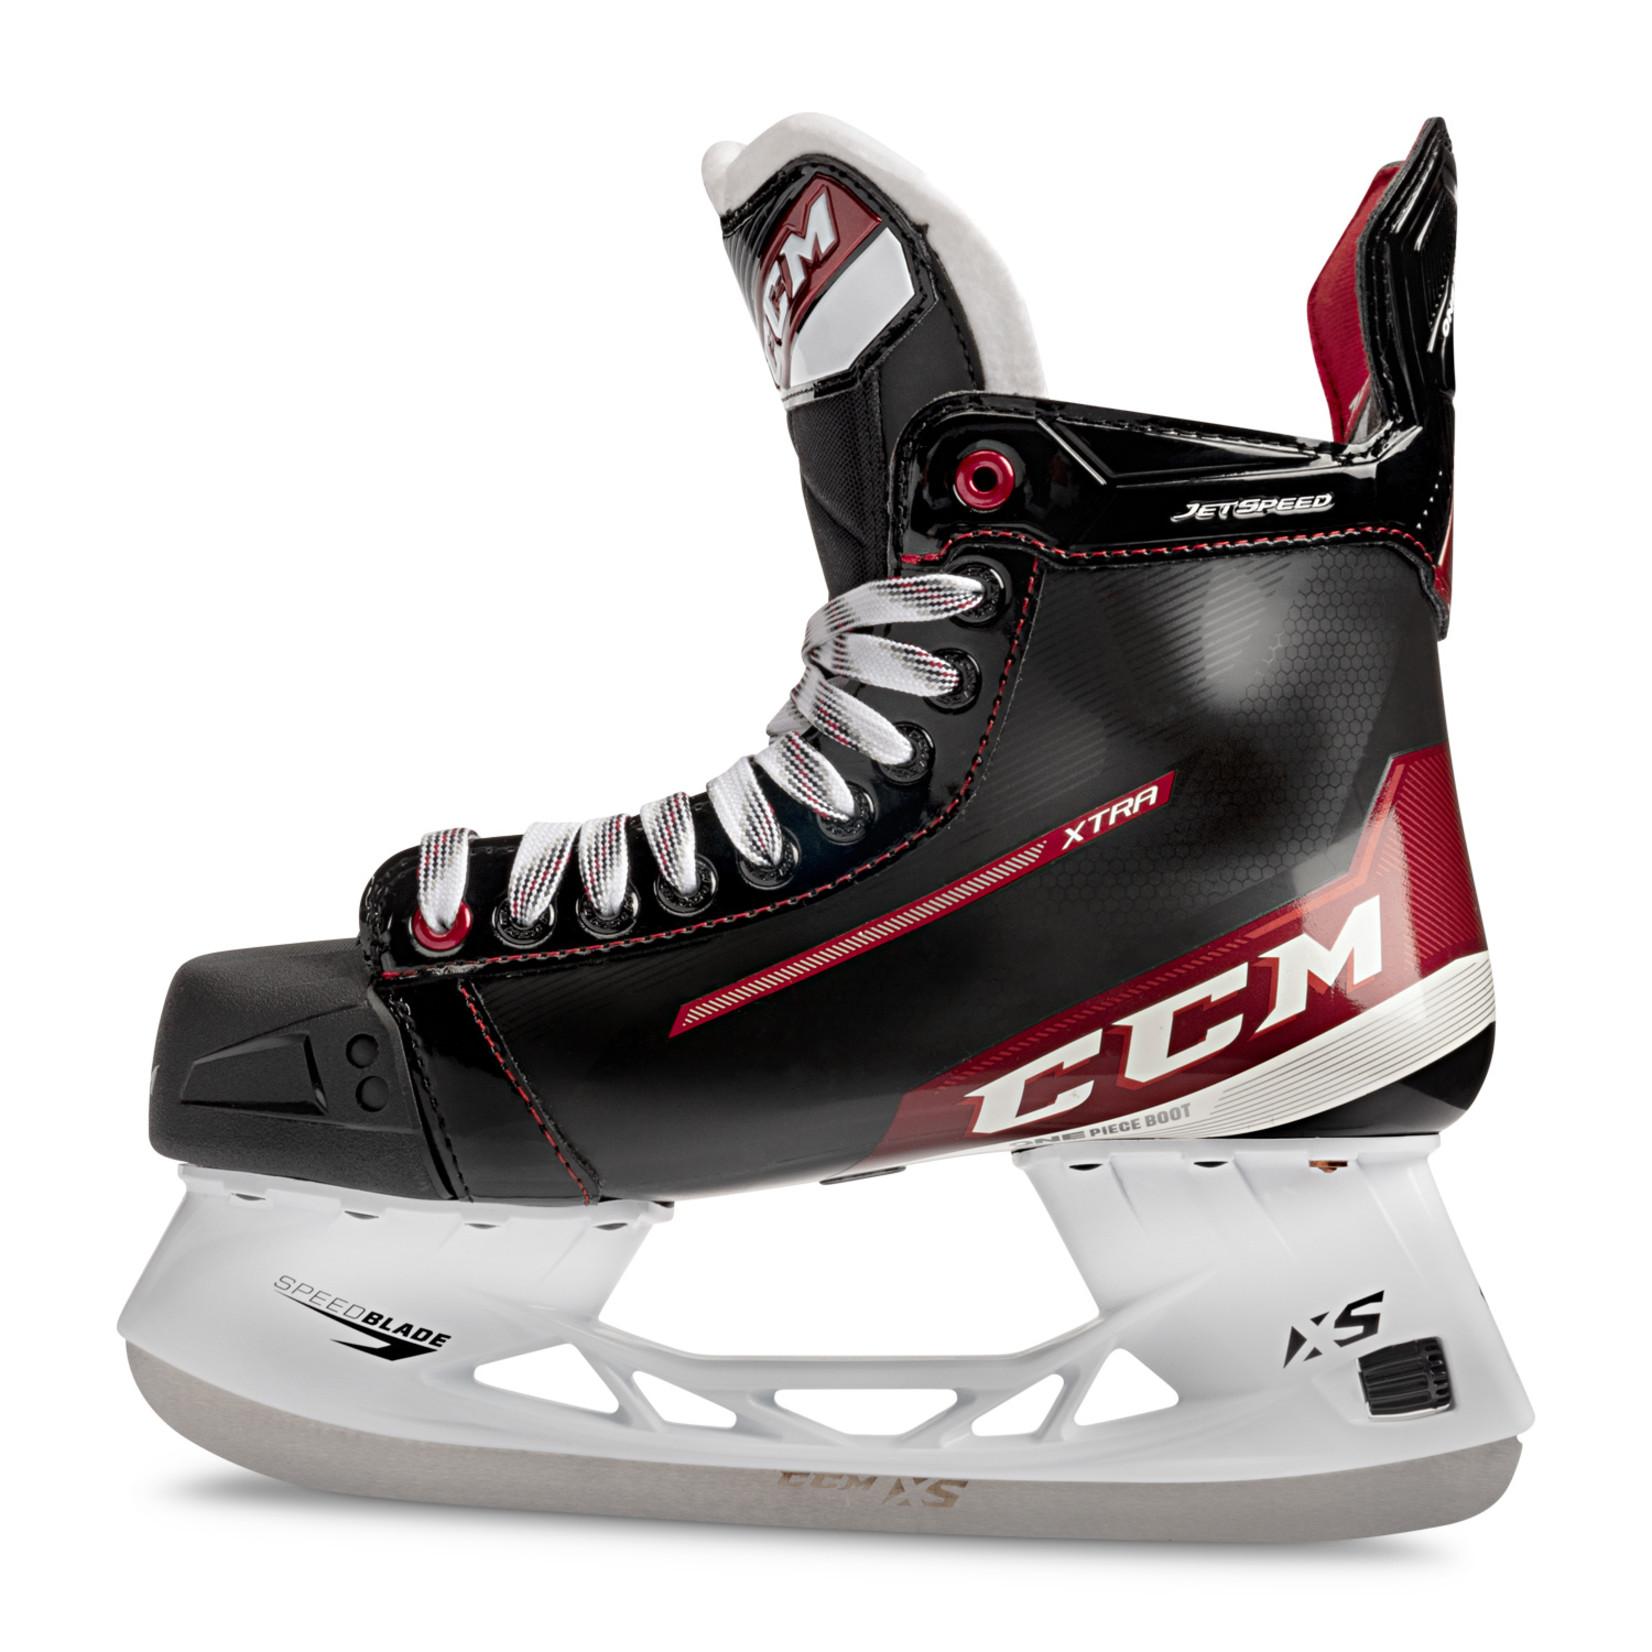 CCM CCM Hockey Skates, Jetspeed Xtra, Intermediate